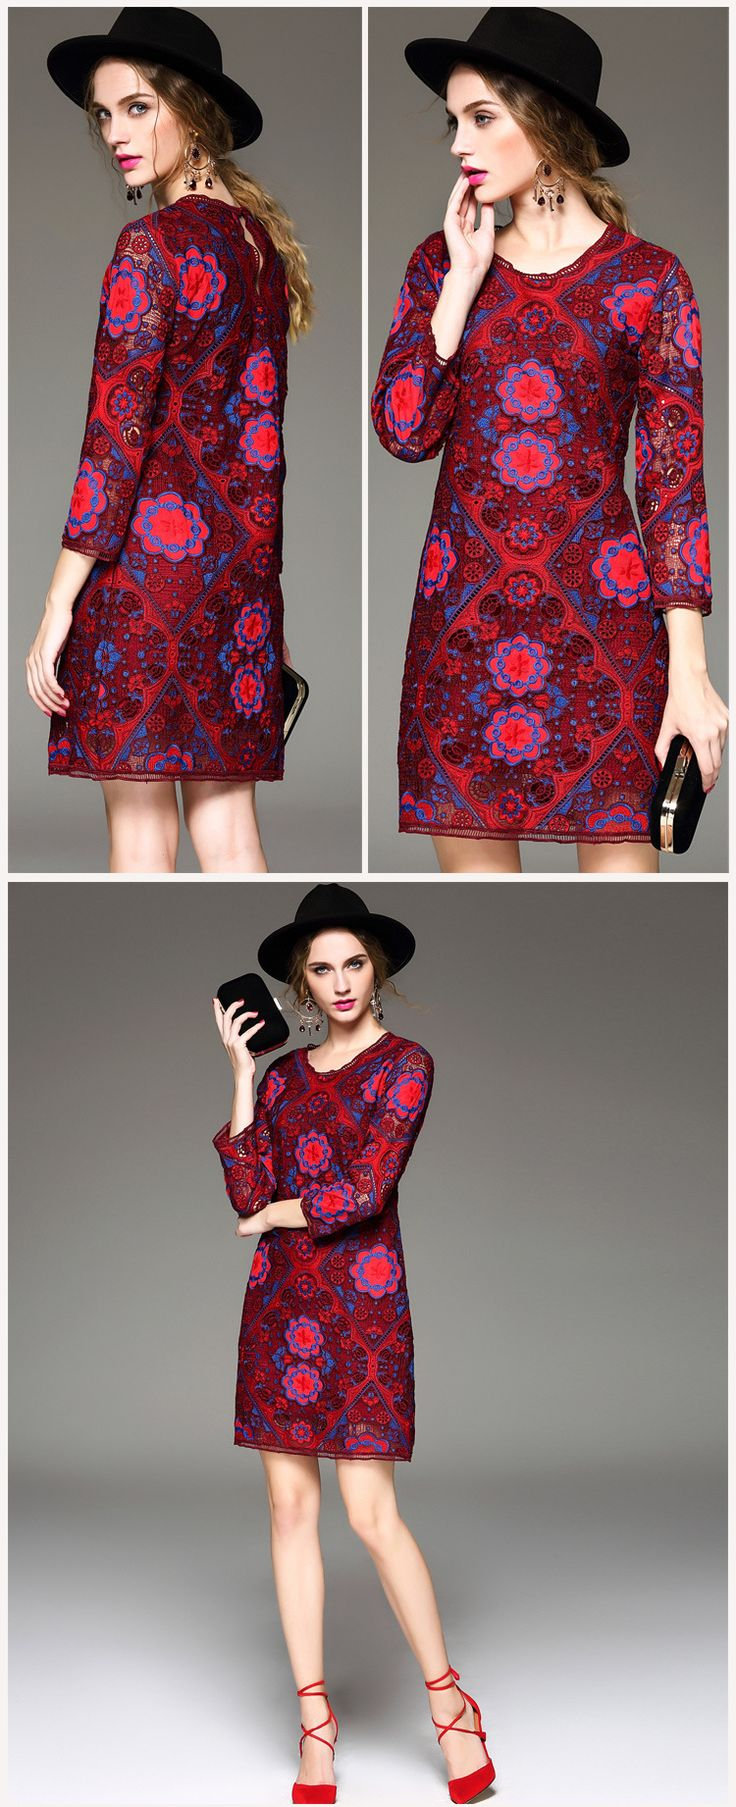 Pentru un plus de senzualitate, alege o #rochie rosie, cu o #broderie superba si nu vei da gres niciodata! #Tinuta #casual este disponibila doar pe #Topfashion.